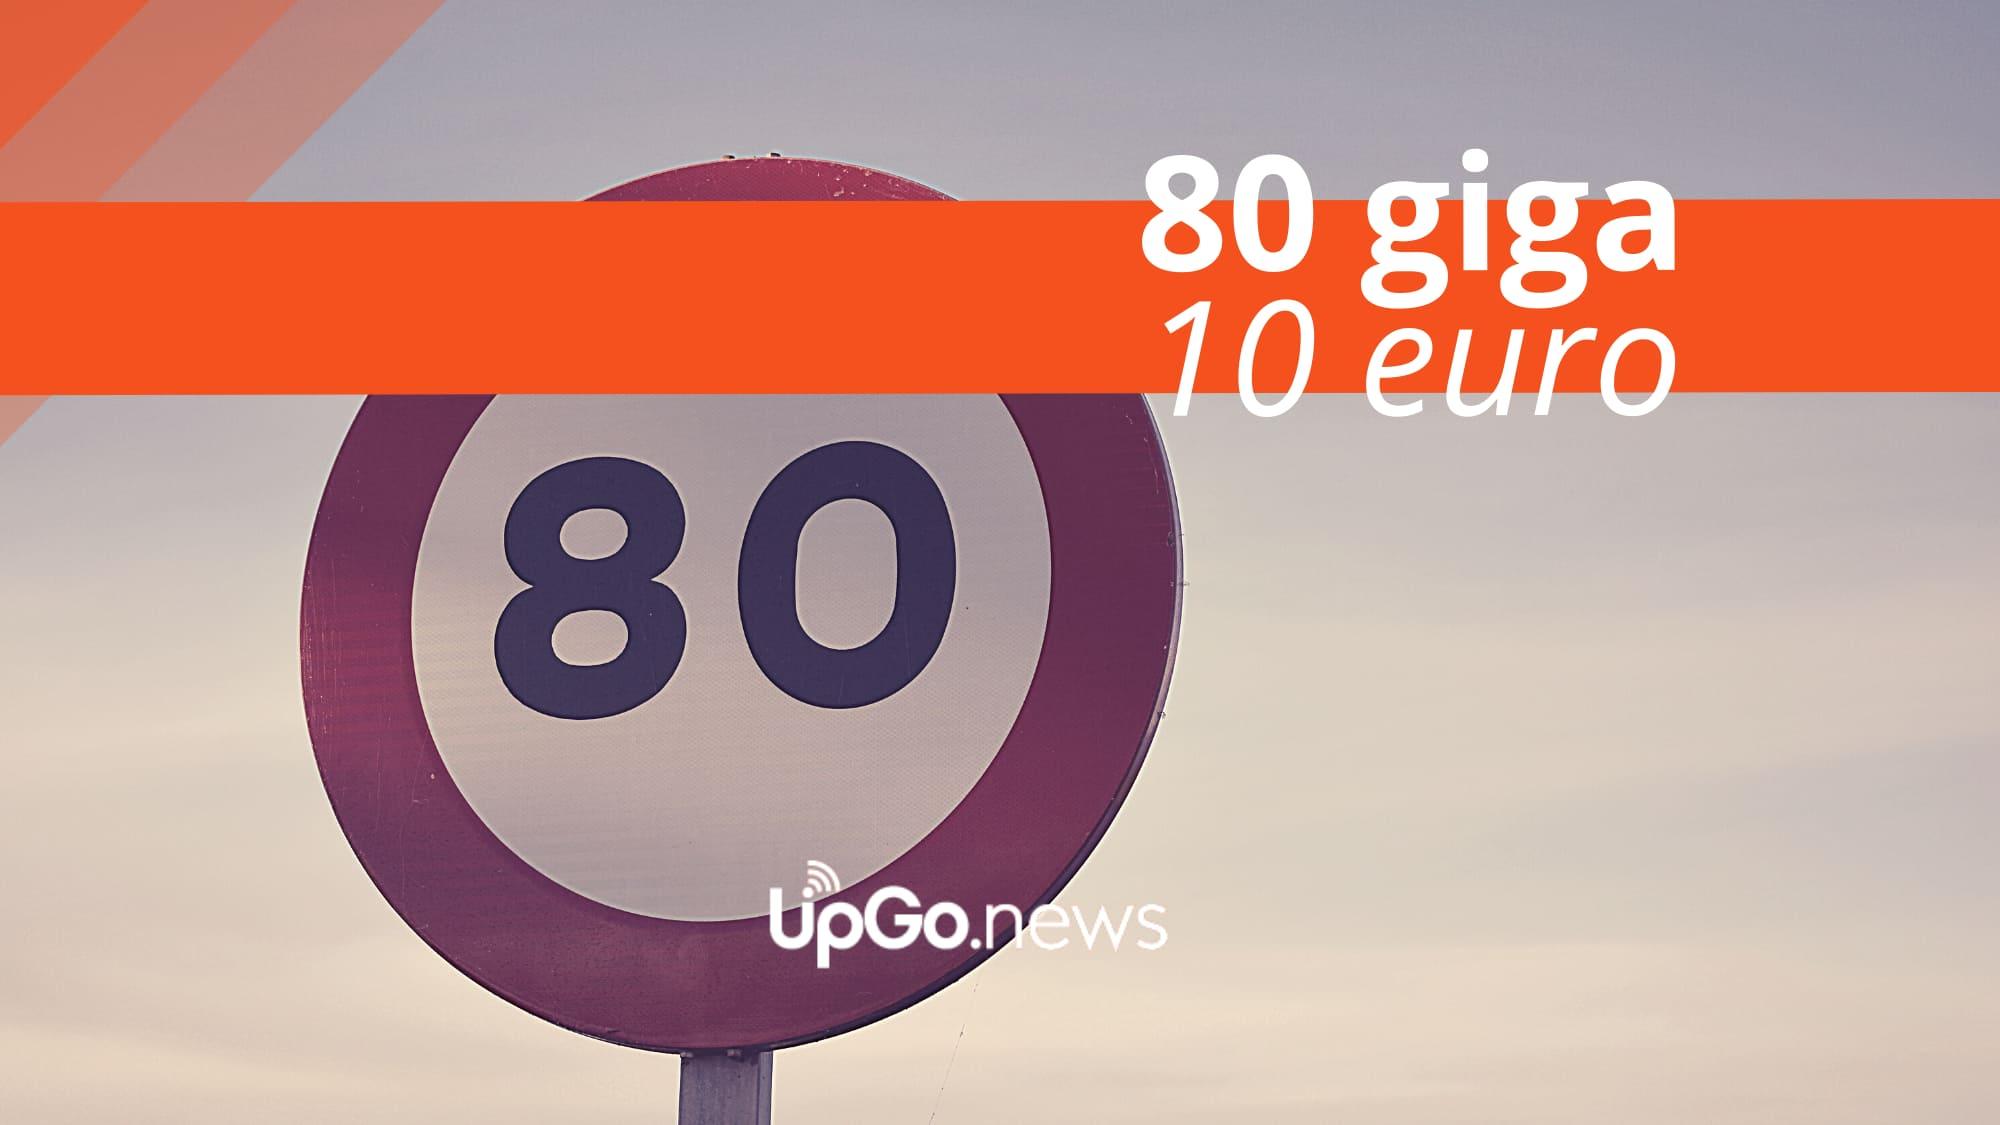 80 Giga 10 euro